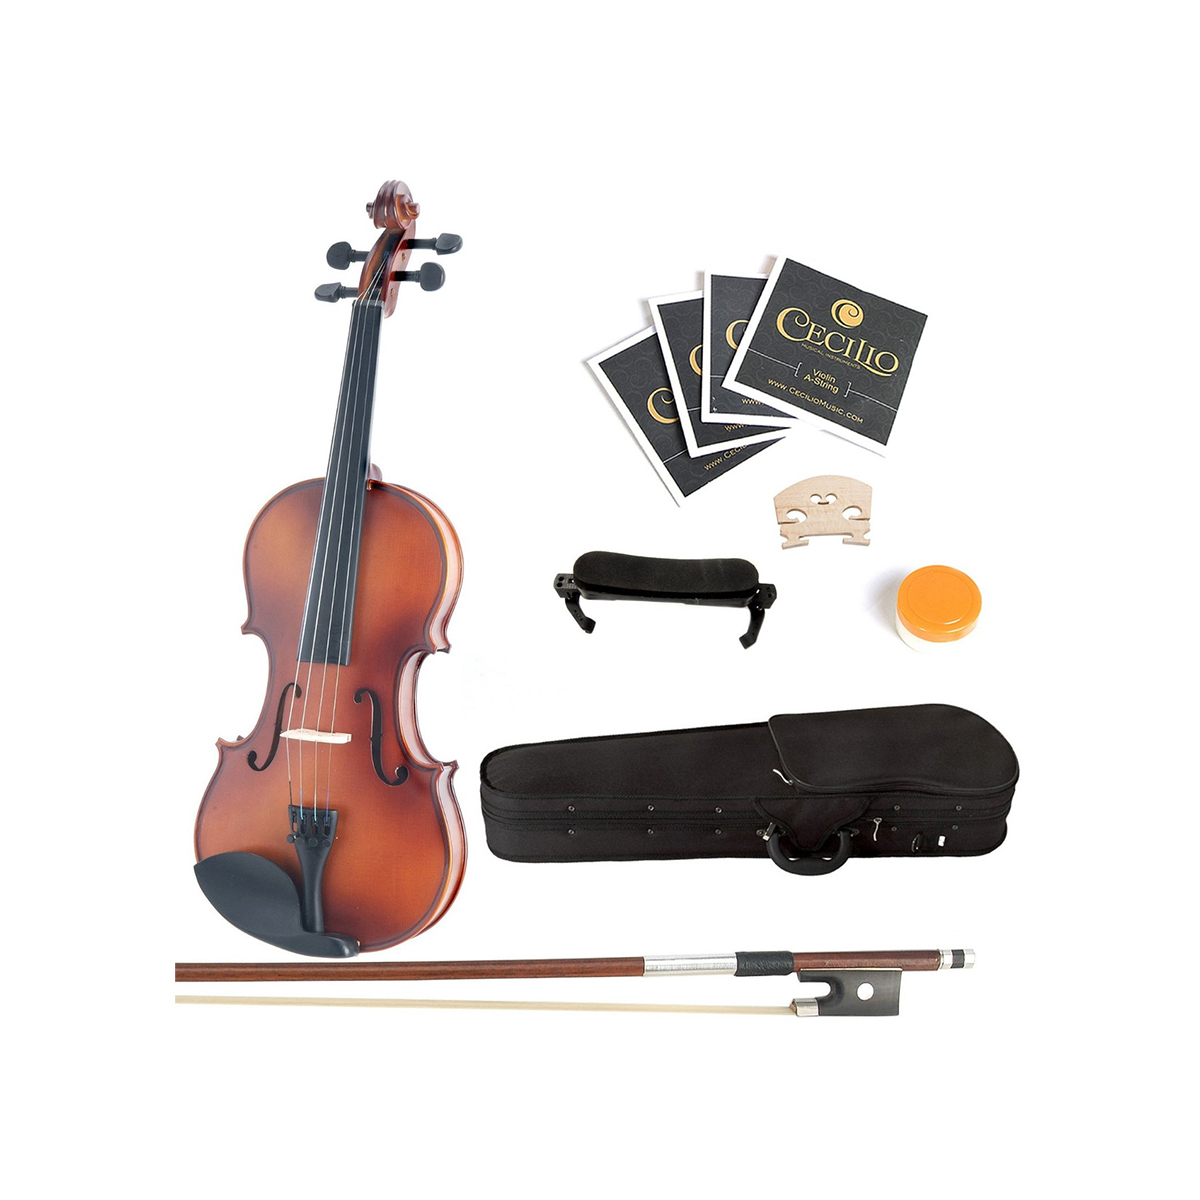 Mendini バイオリン MV300 フルサイズ 4/4 オーケストラ クラシック 楽器